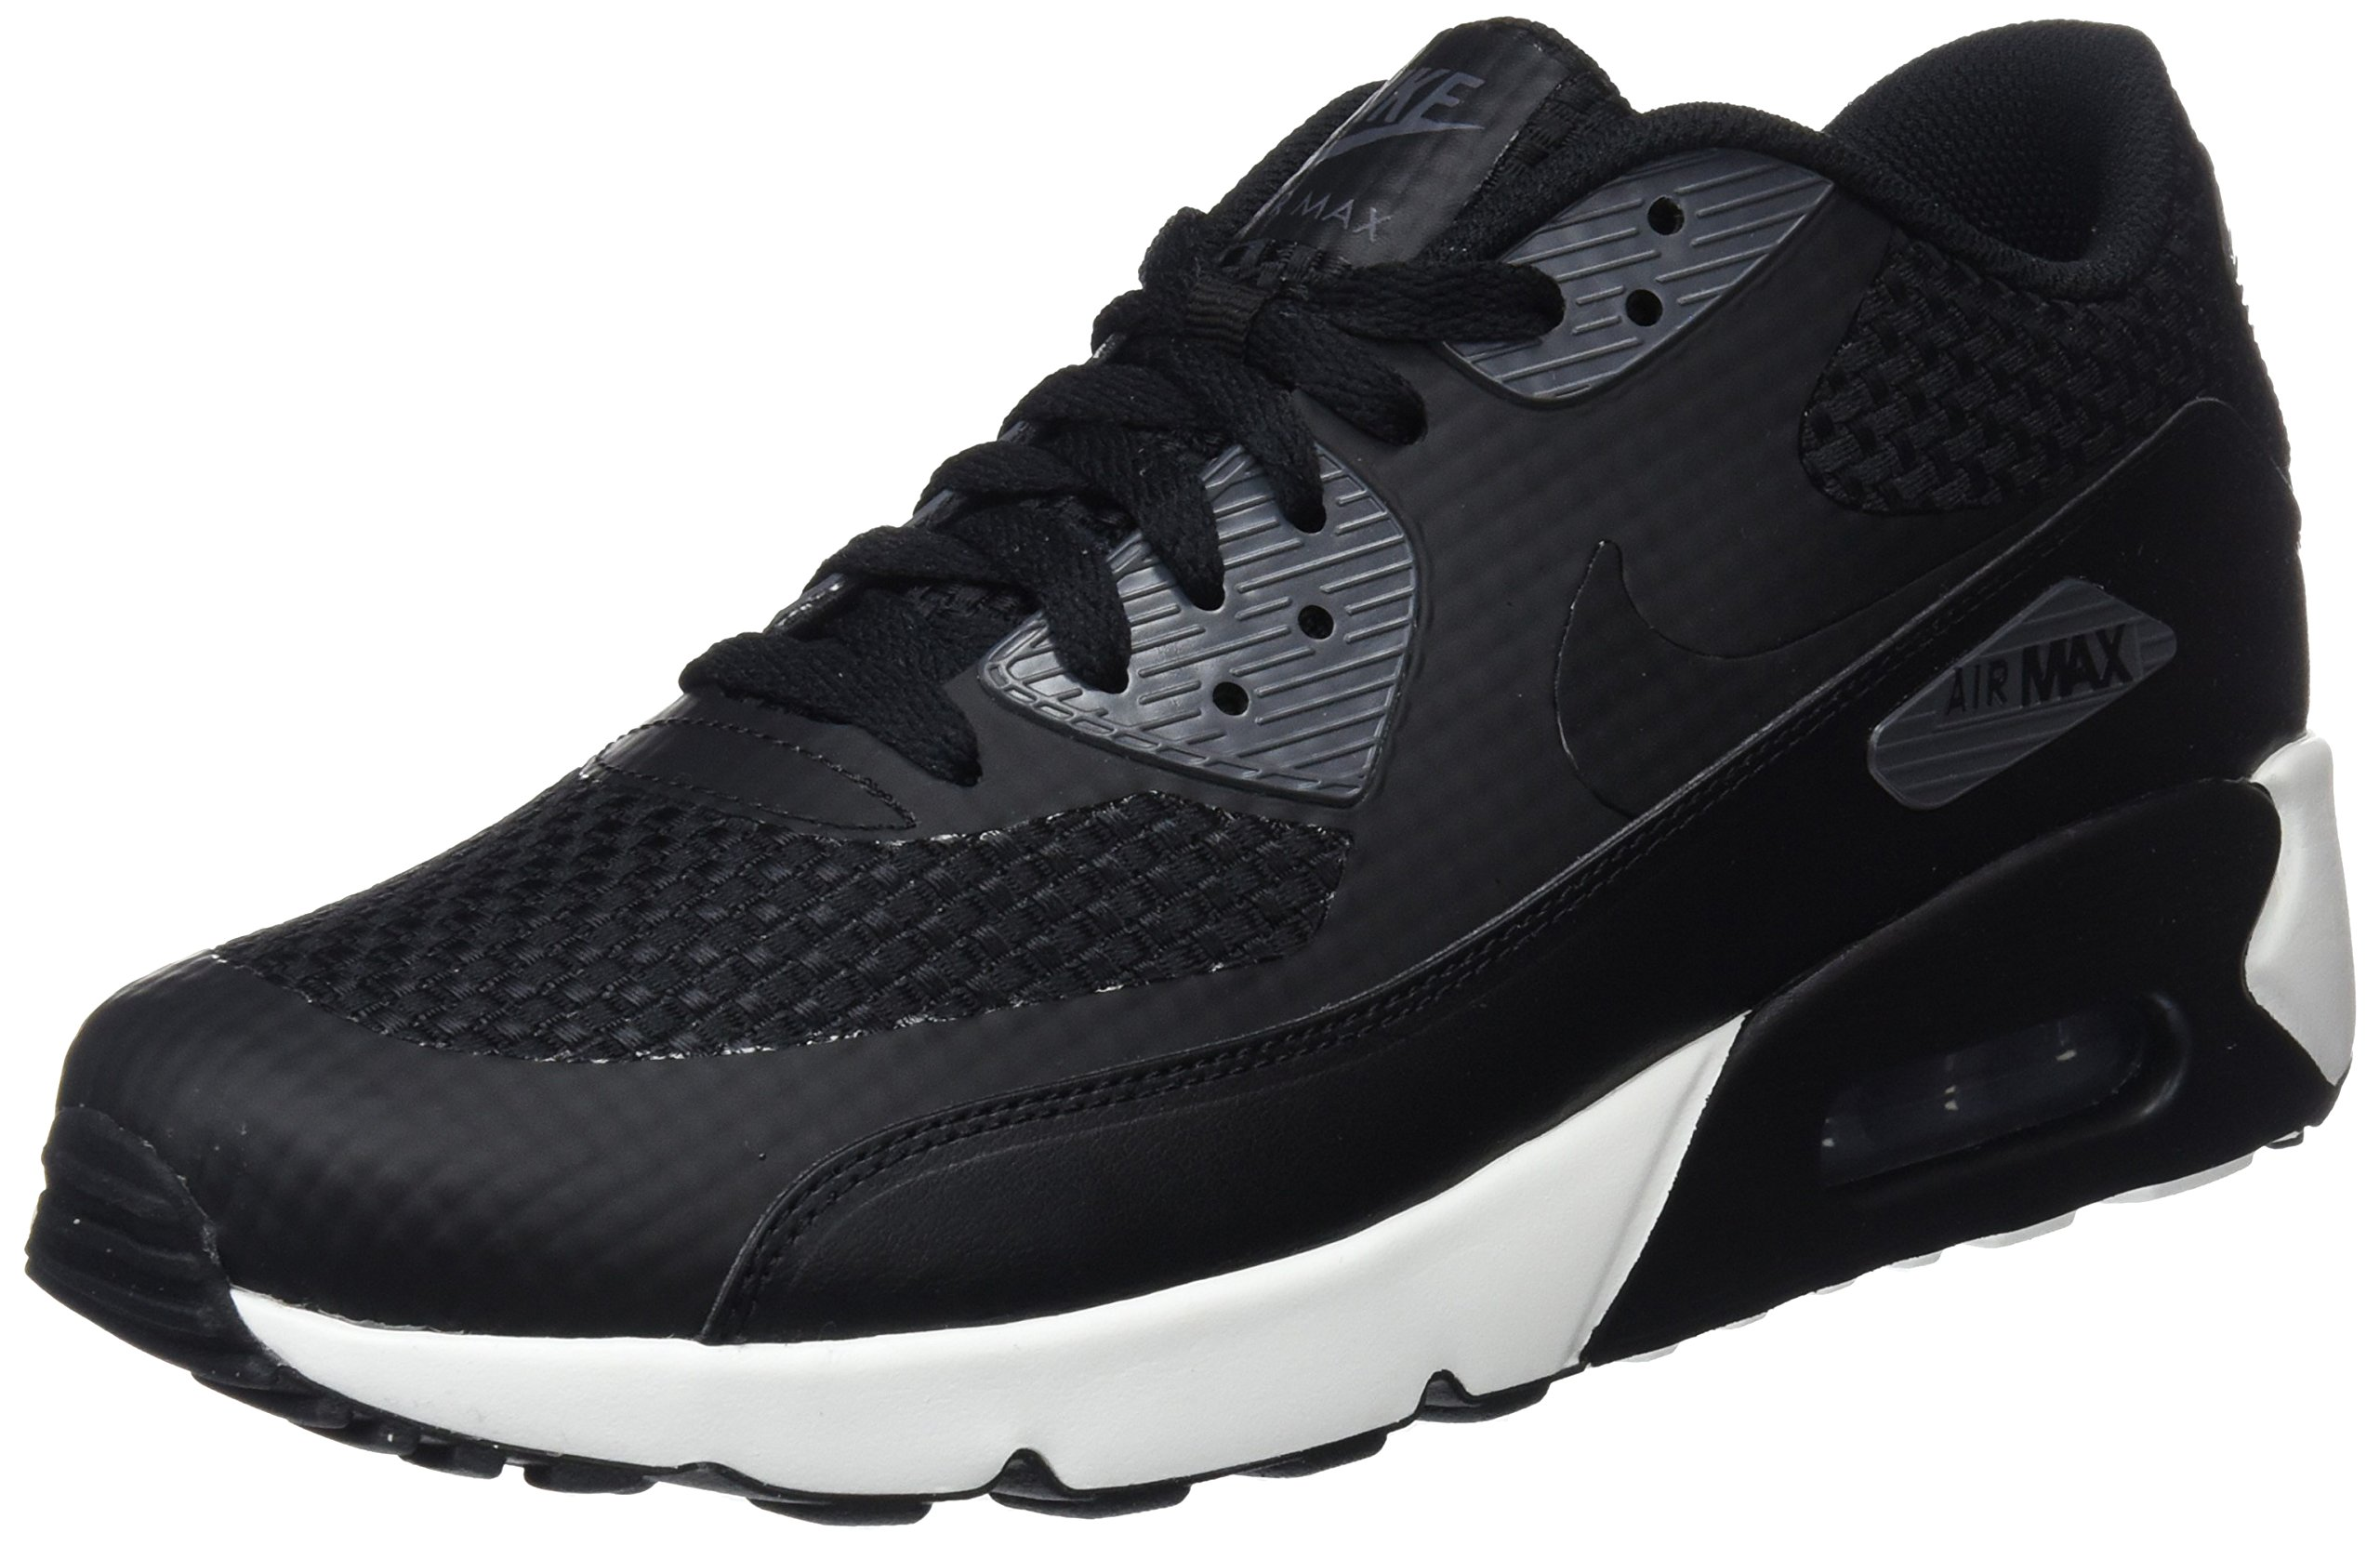 premium selection 47bc7 db9b1 Galleon - NIKE Mens Air Max 90 Ultra 2.0 SE Running Shoes Black Black Dark  Grey Sail 876005-007 Size 11.5